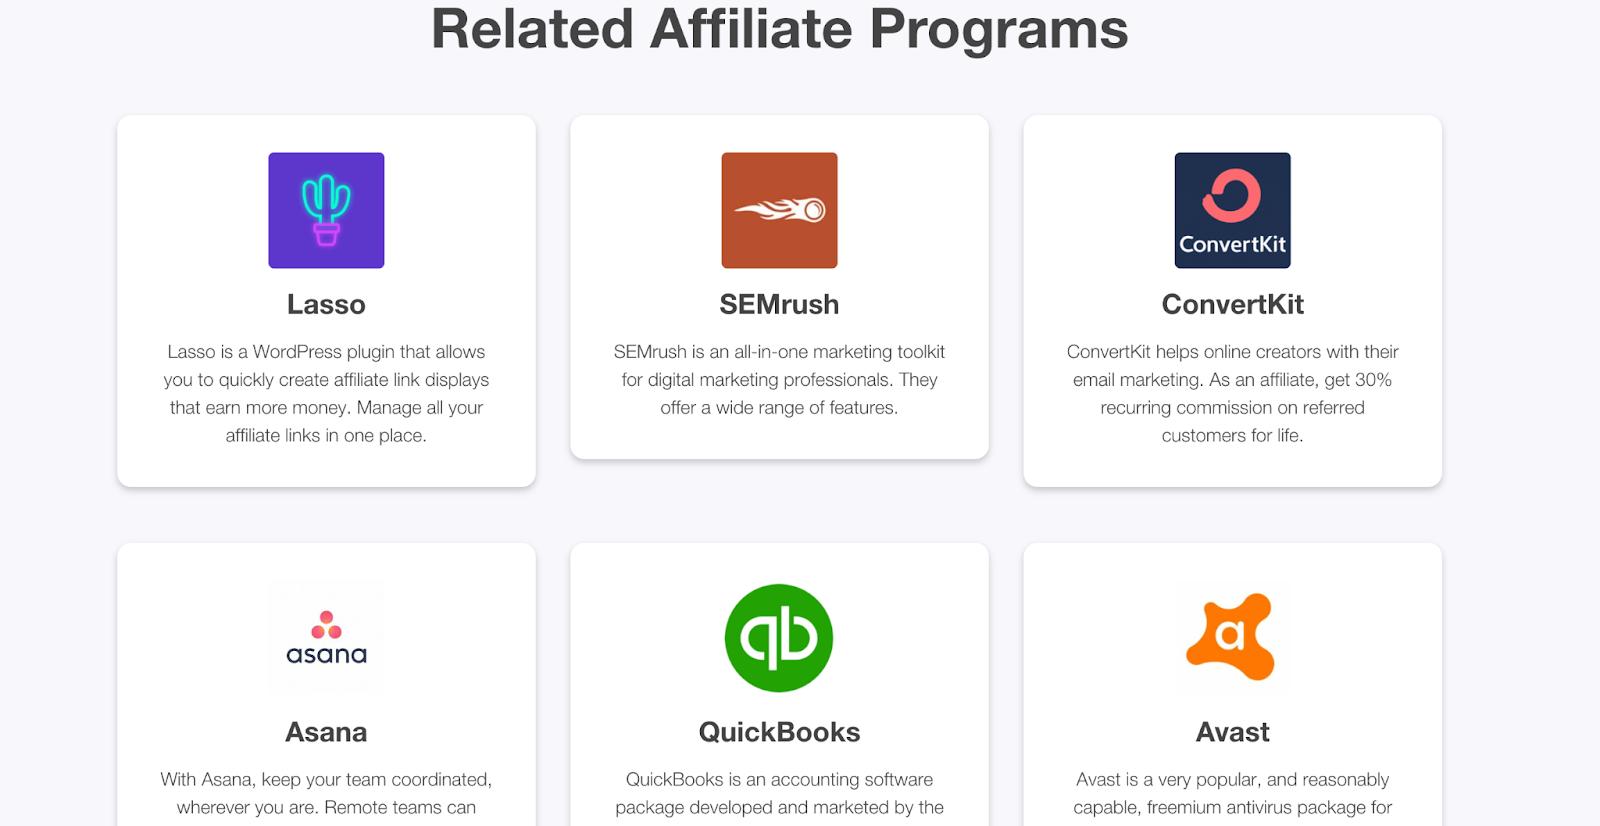 related affiliate programs beneath wp rocket